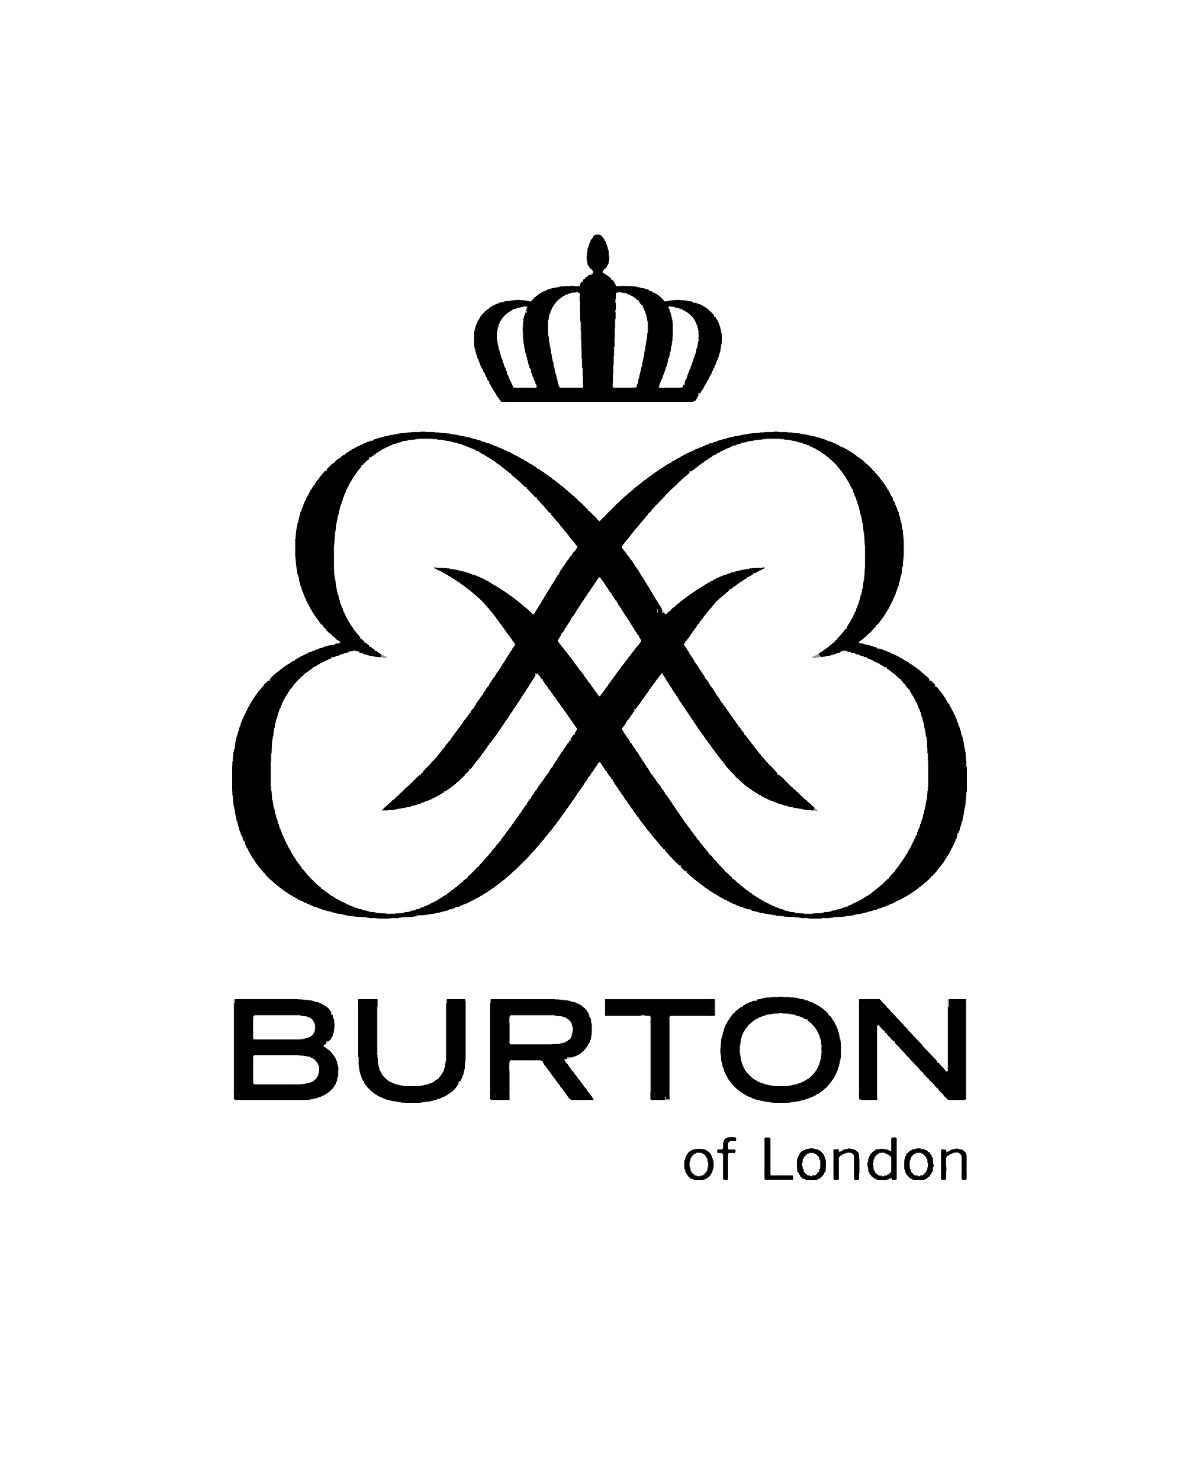 Rosace Burton.png